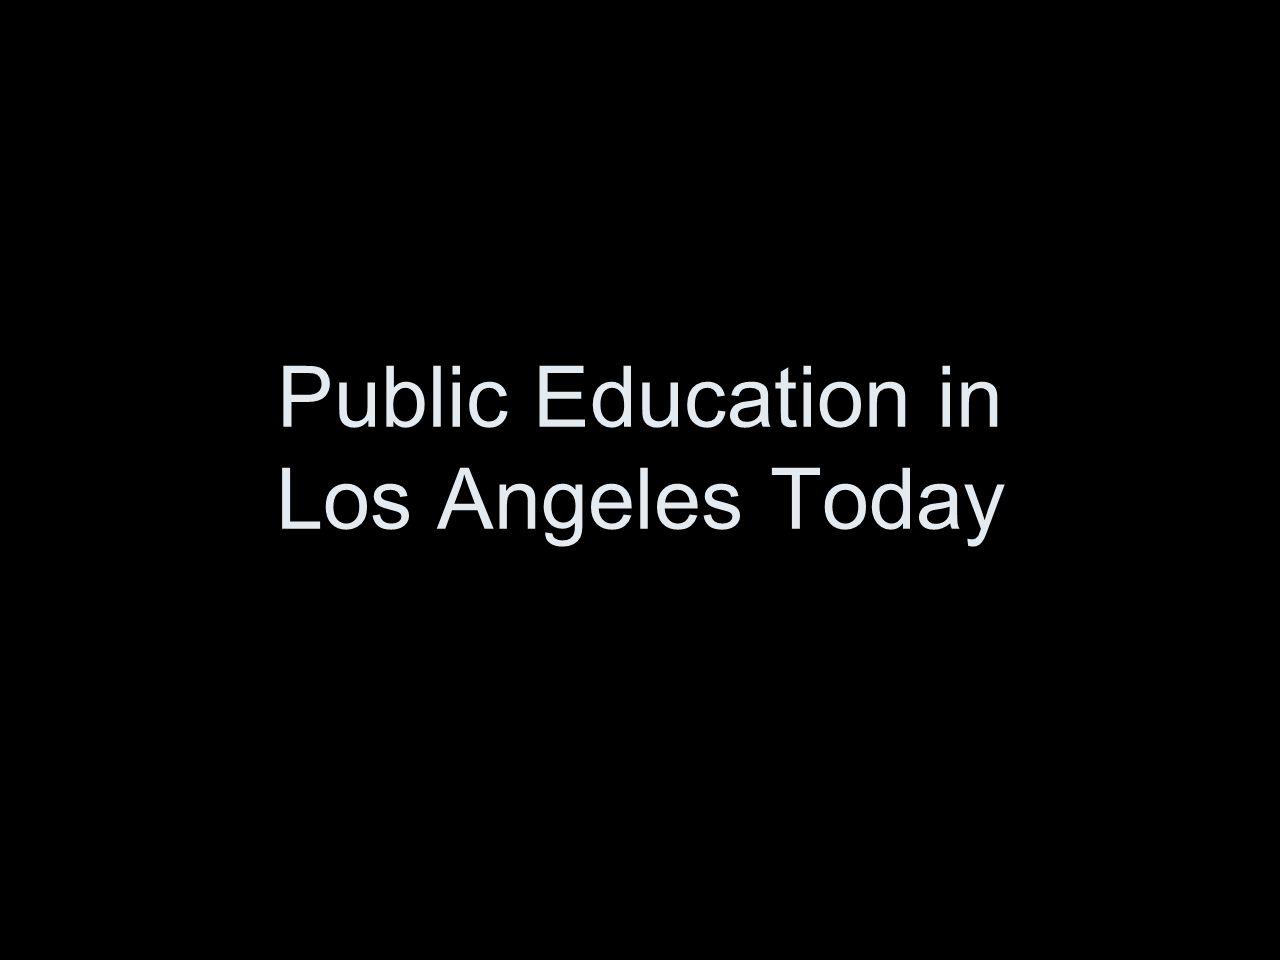 Public Education in Los Angeles Today